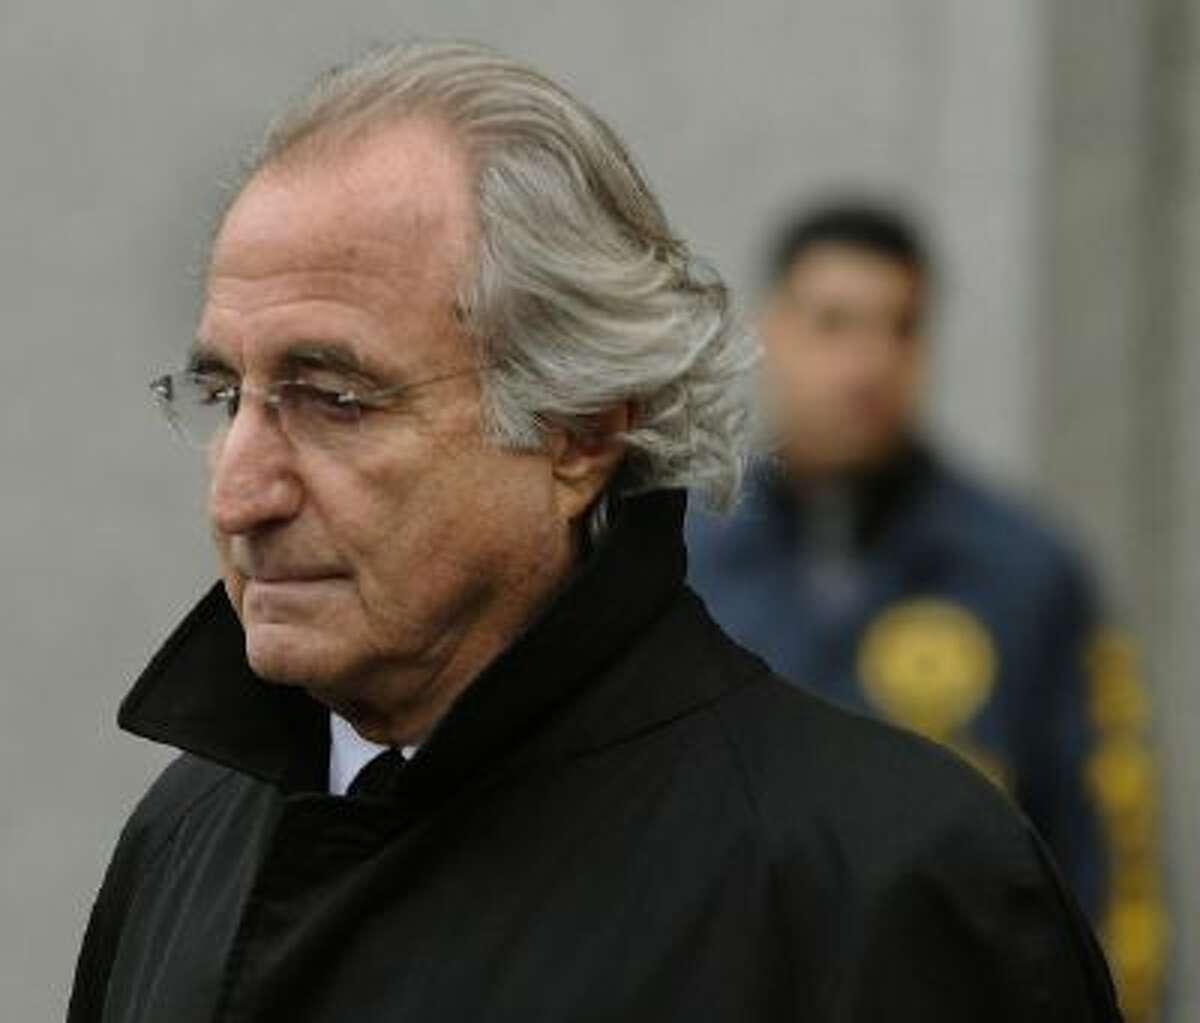 Bernard L. Madoff leaves US Federal Court Jan. 14, 2009.